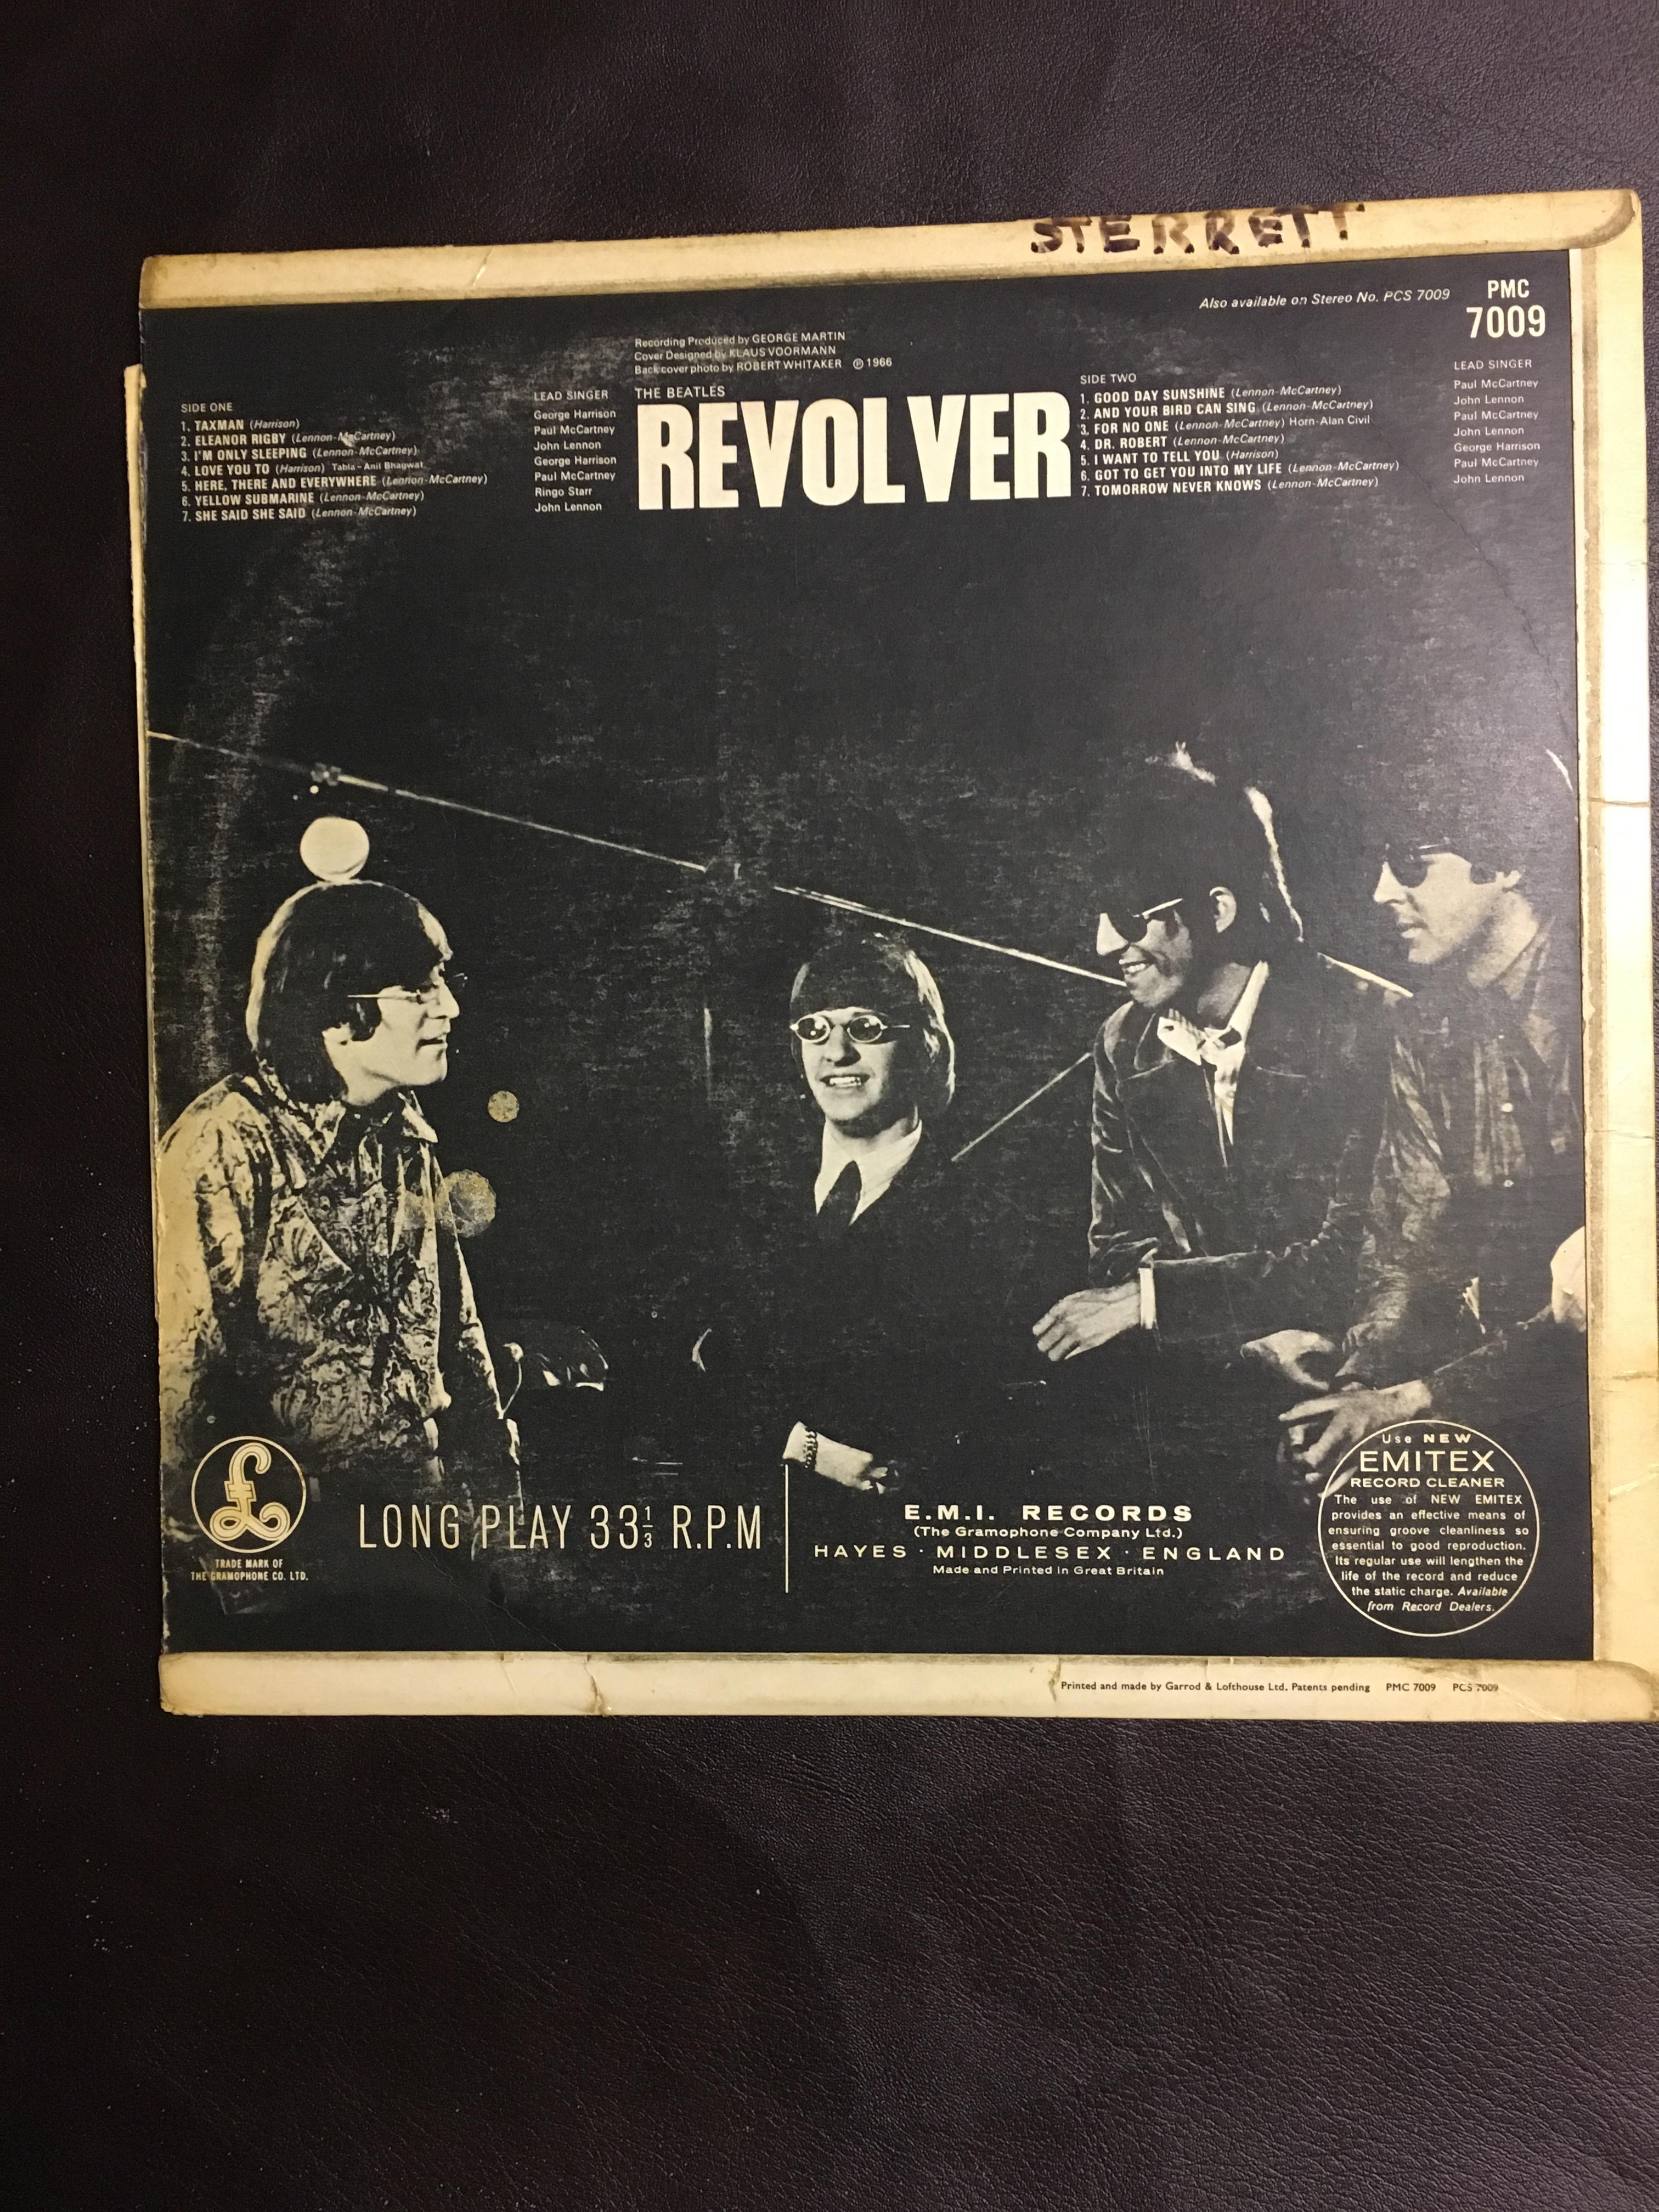 The Beatles Revolver Pmc 7009 First Pressing Uk Mono Vinyl